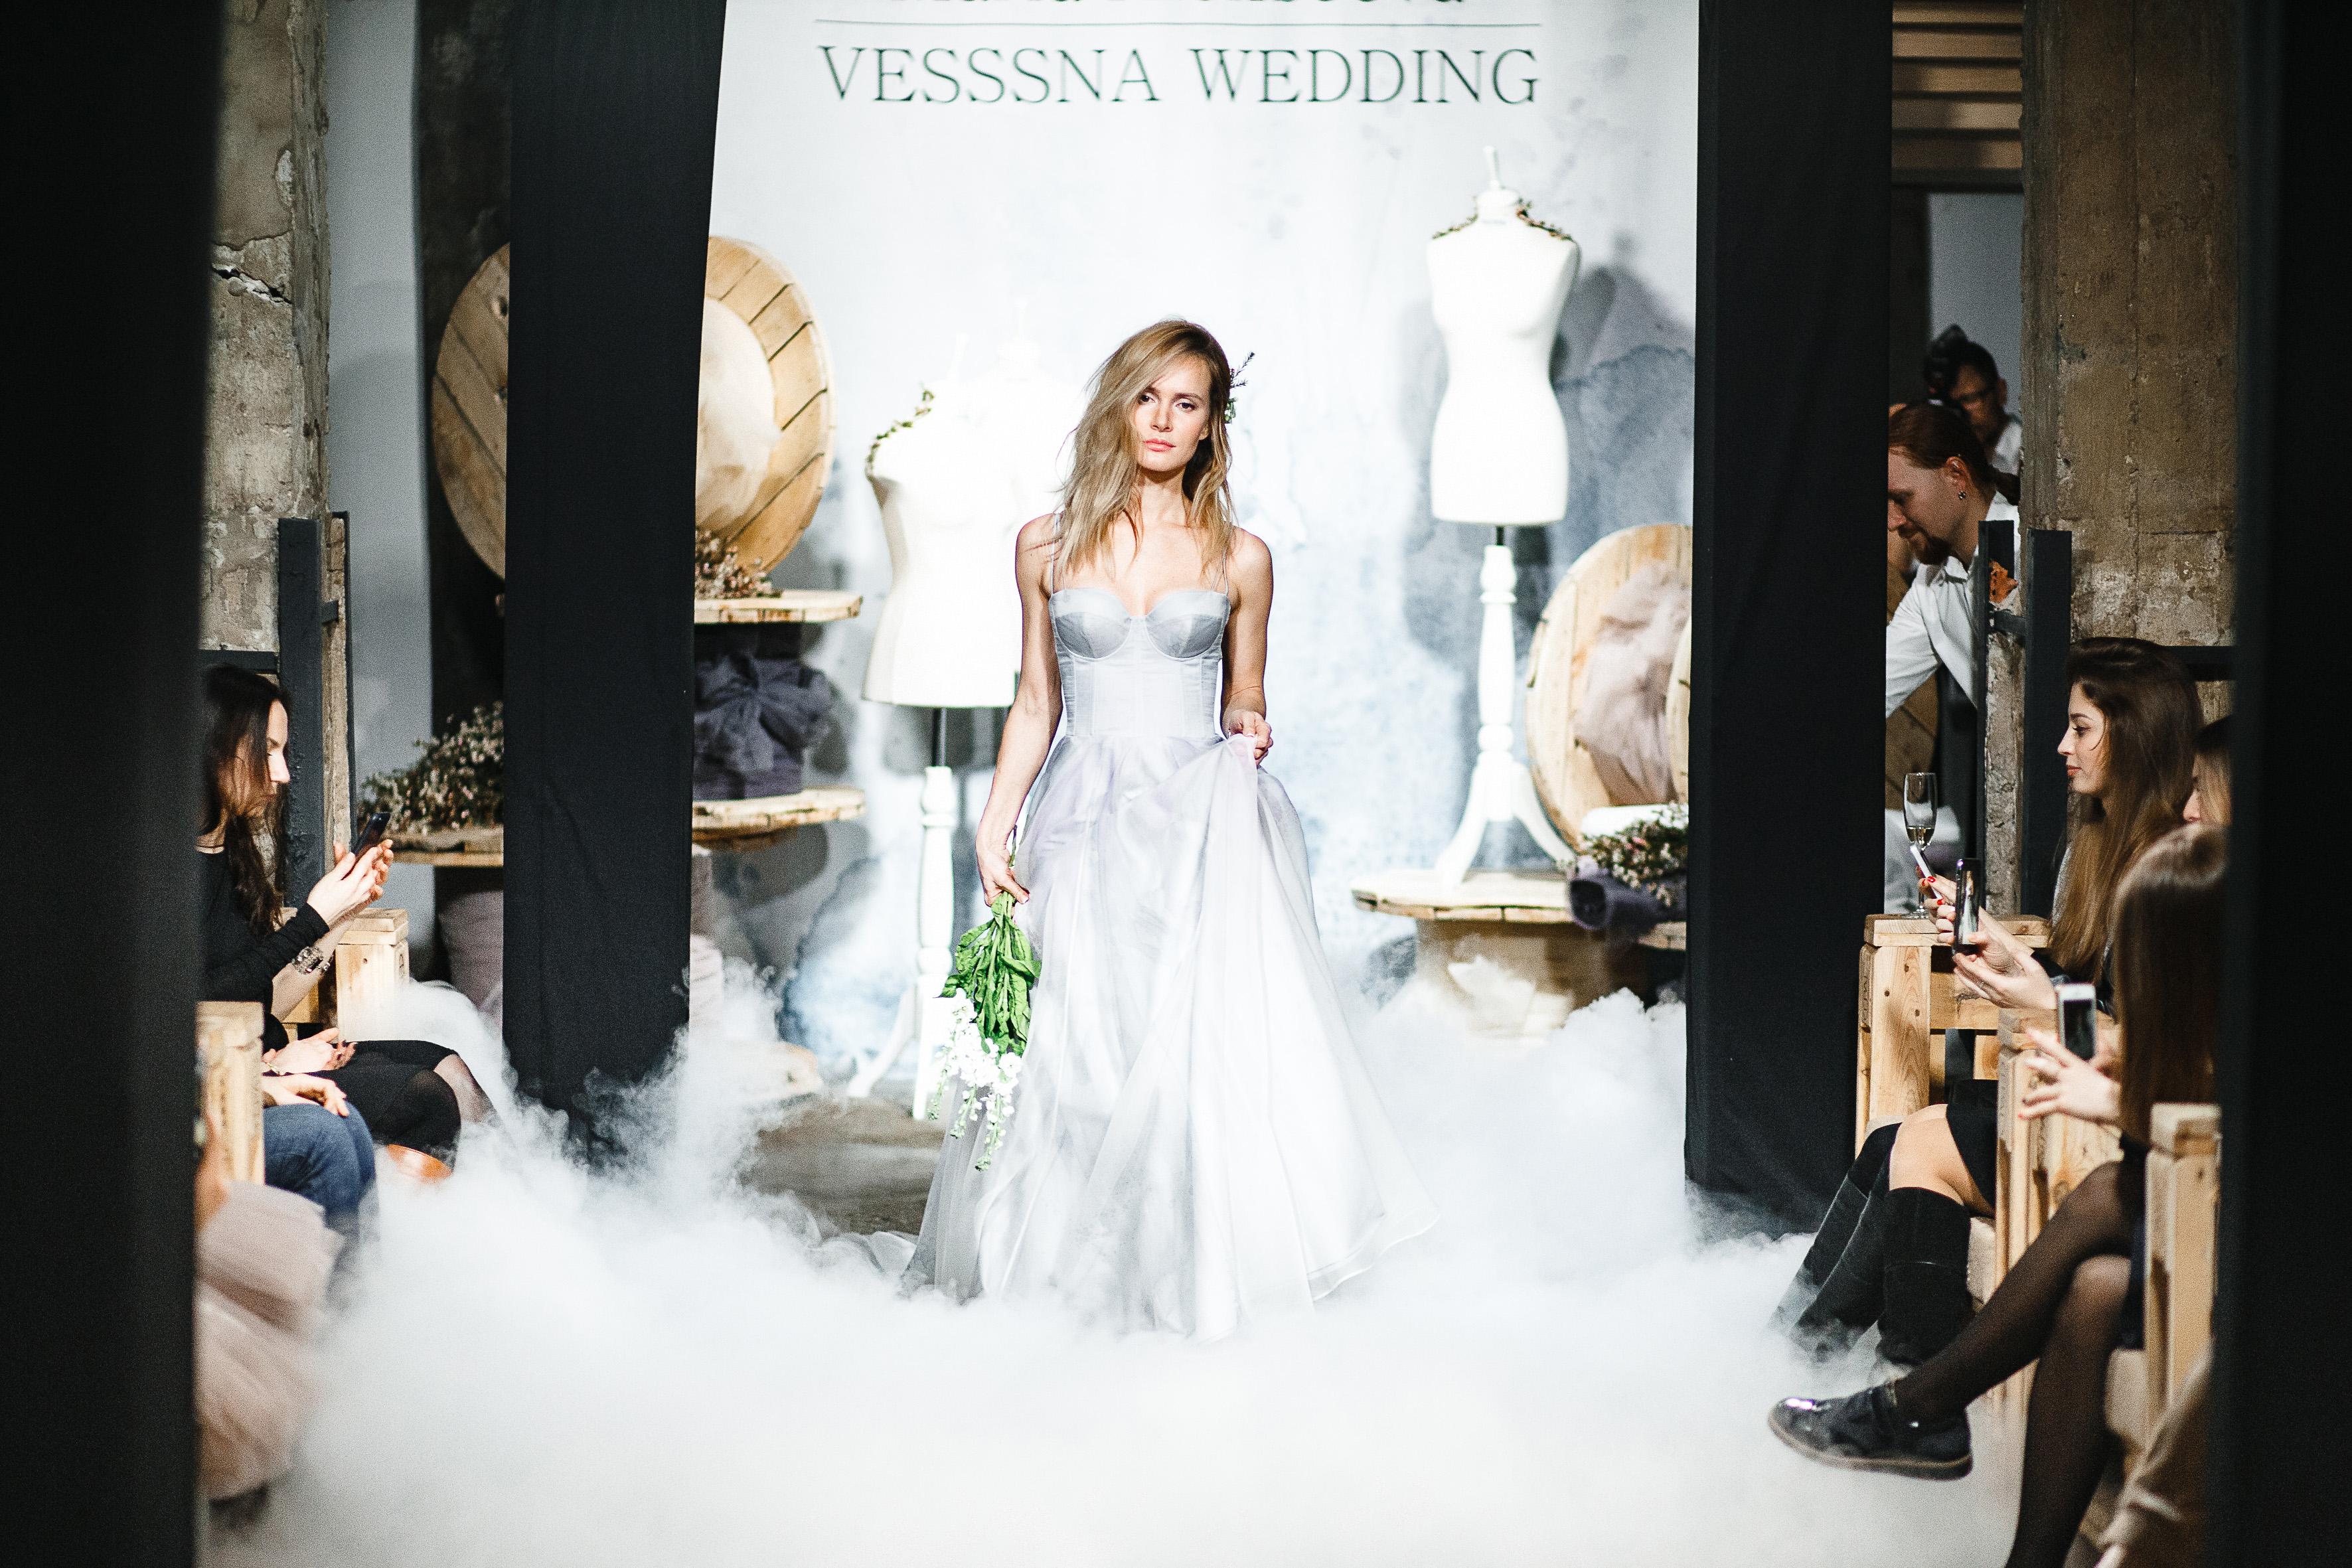 показ коллекции vesssna wedding 10